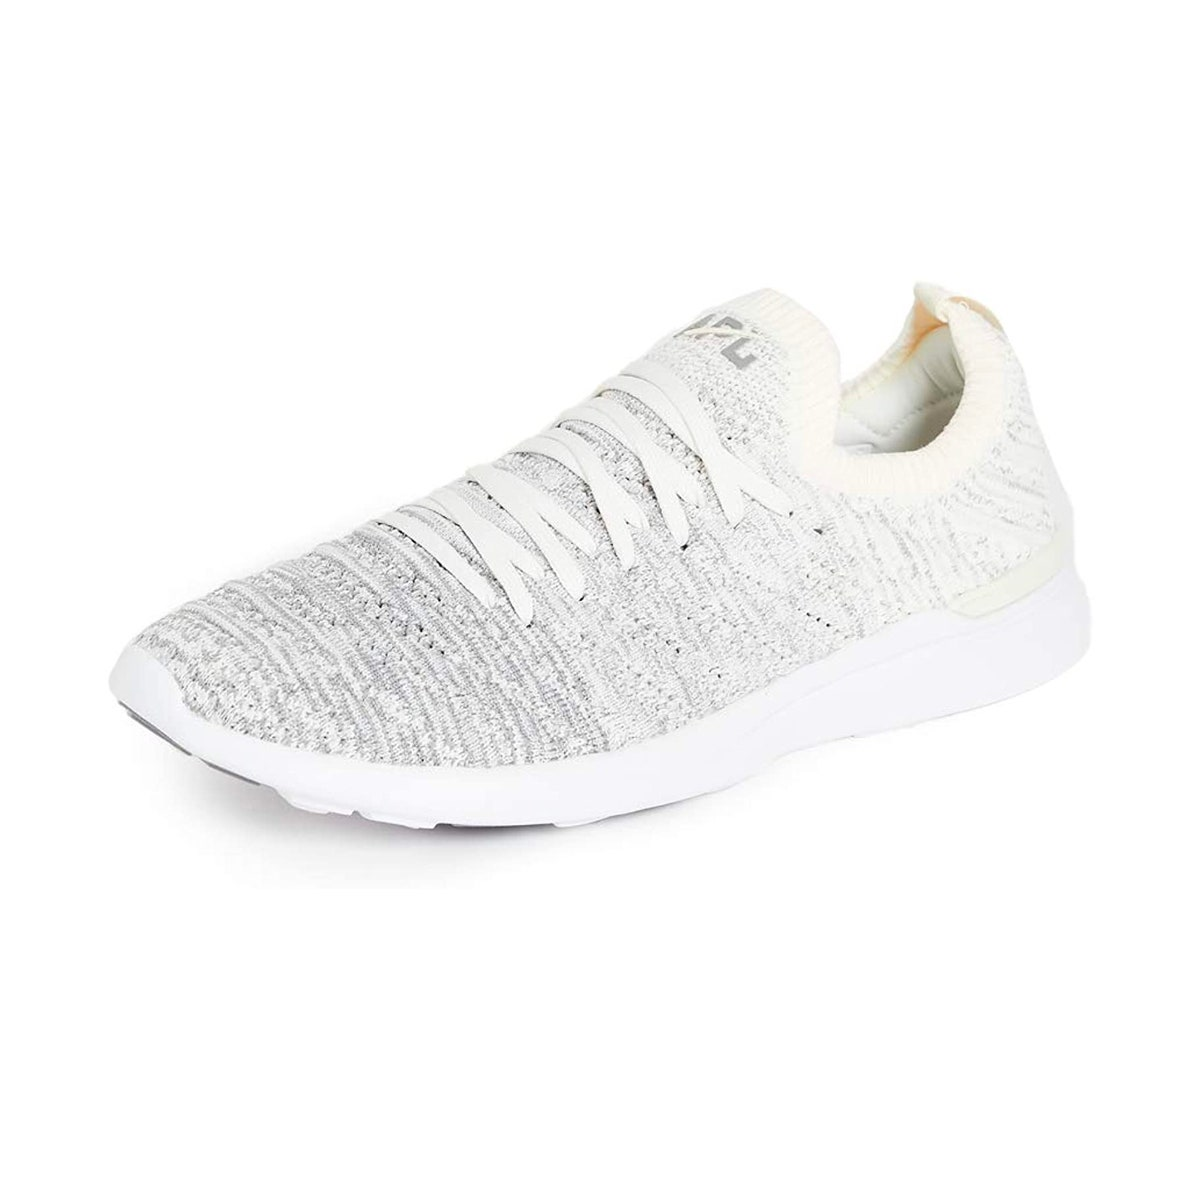 Athletic Propulsion Labs Techloom Wave Sneakers